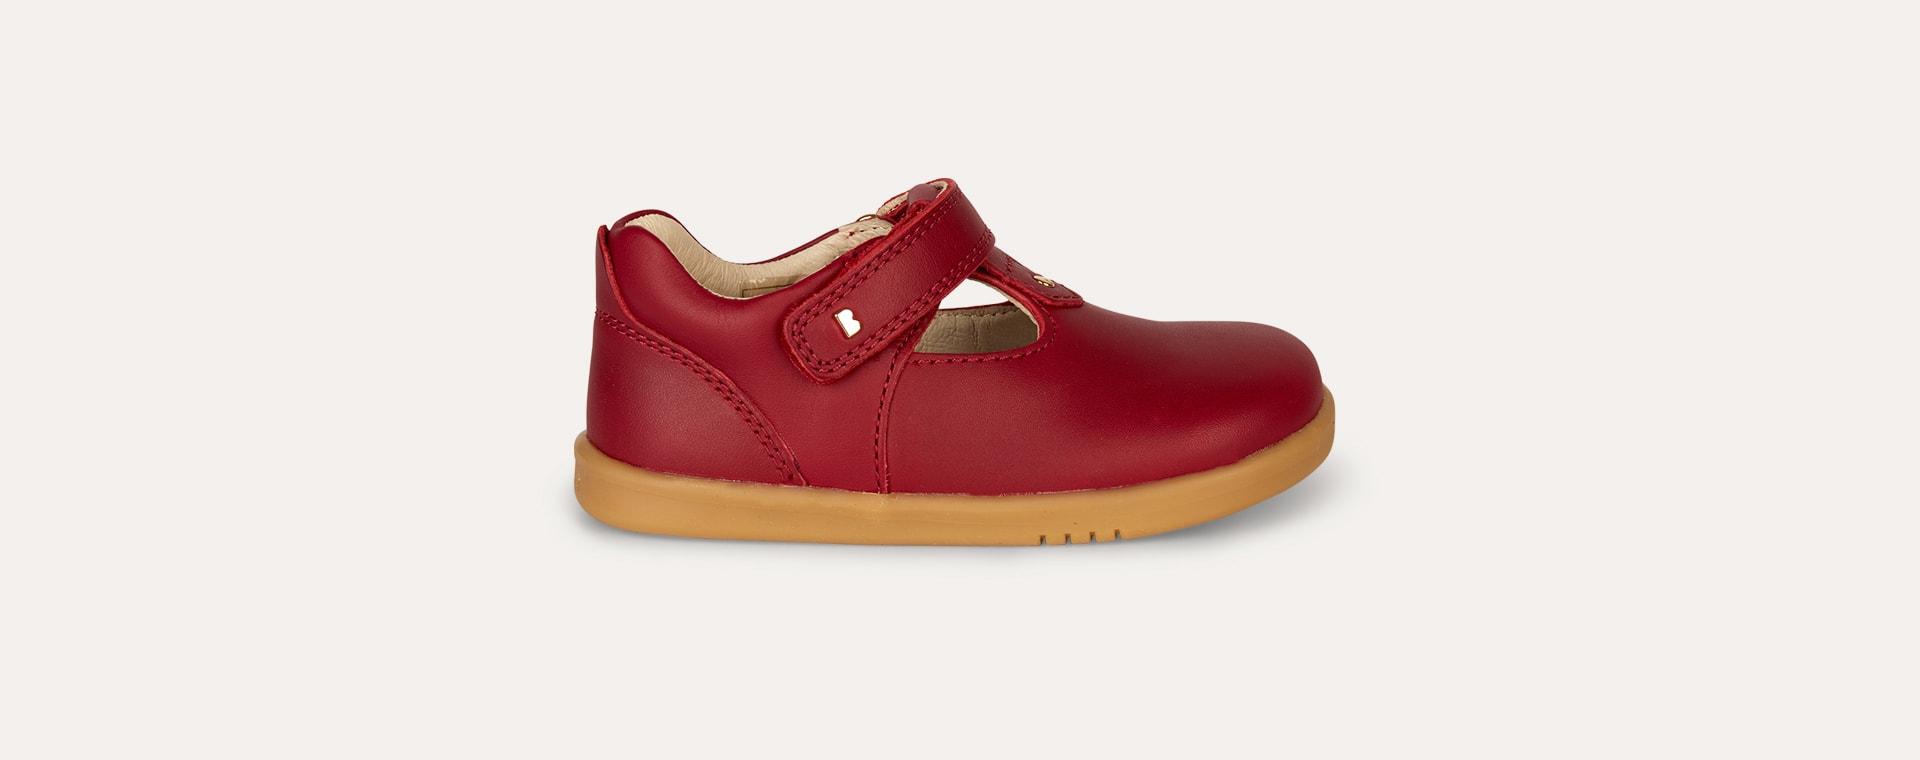 Rio Bobux I-Walk Louise T-bar Shoe